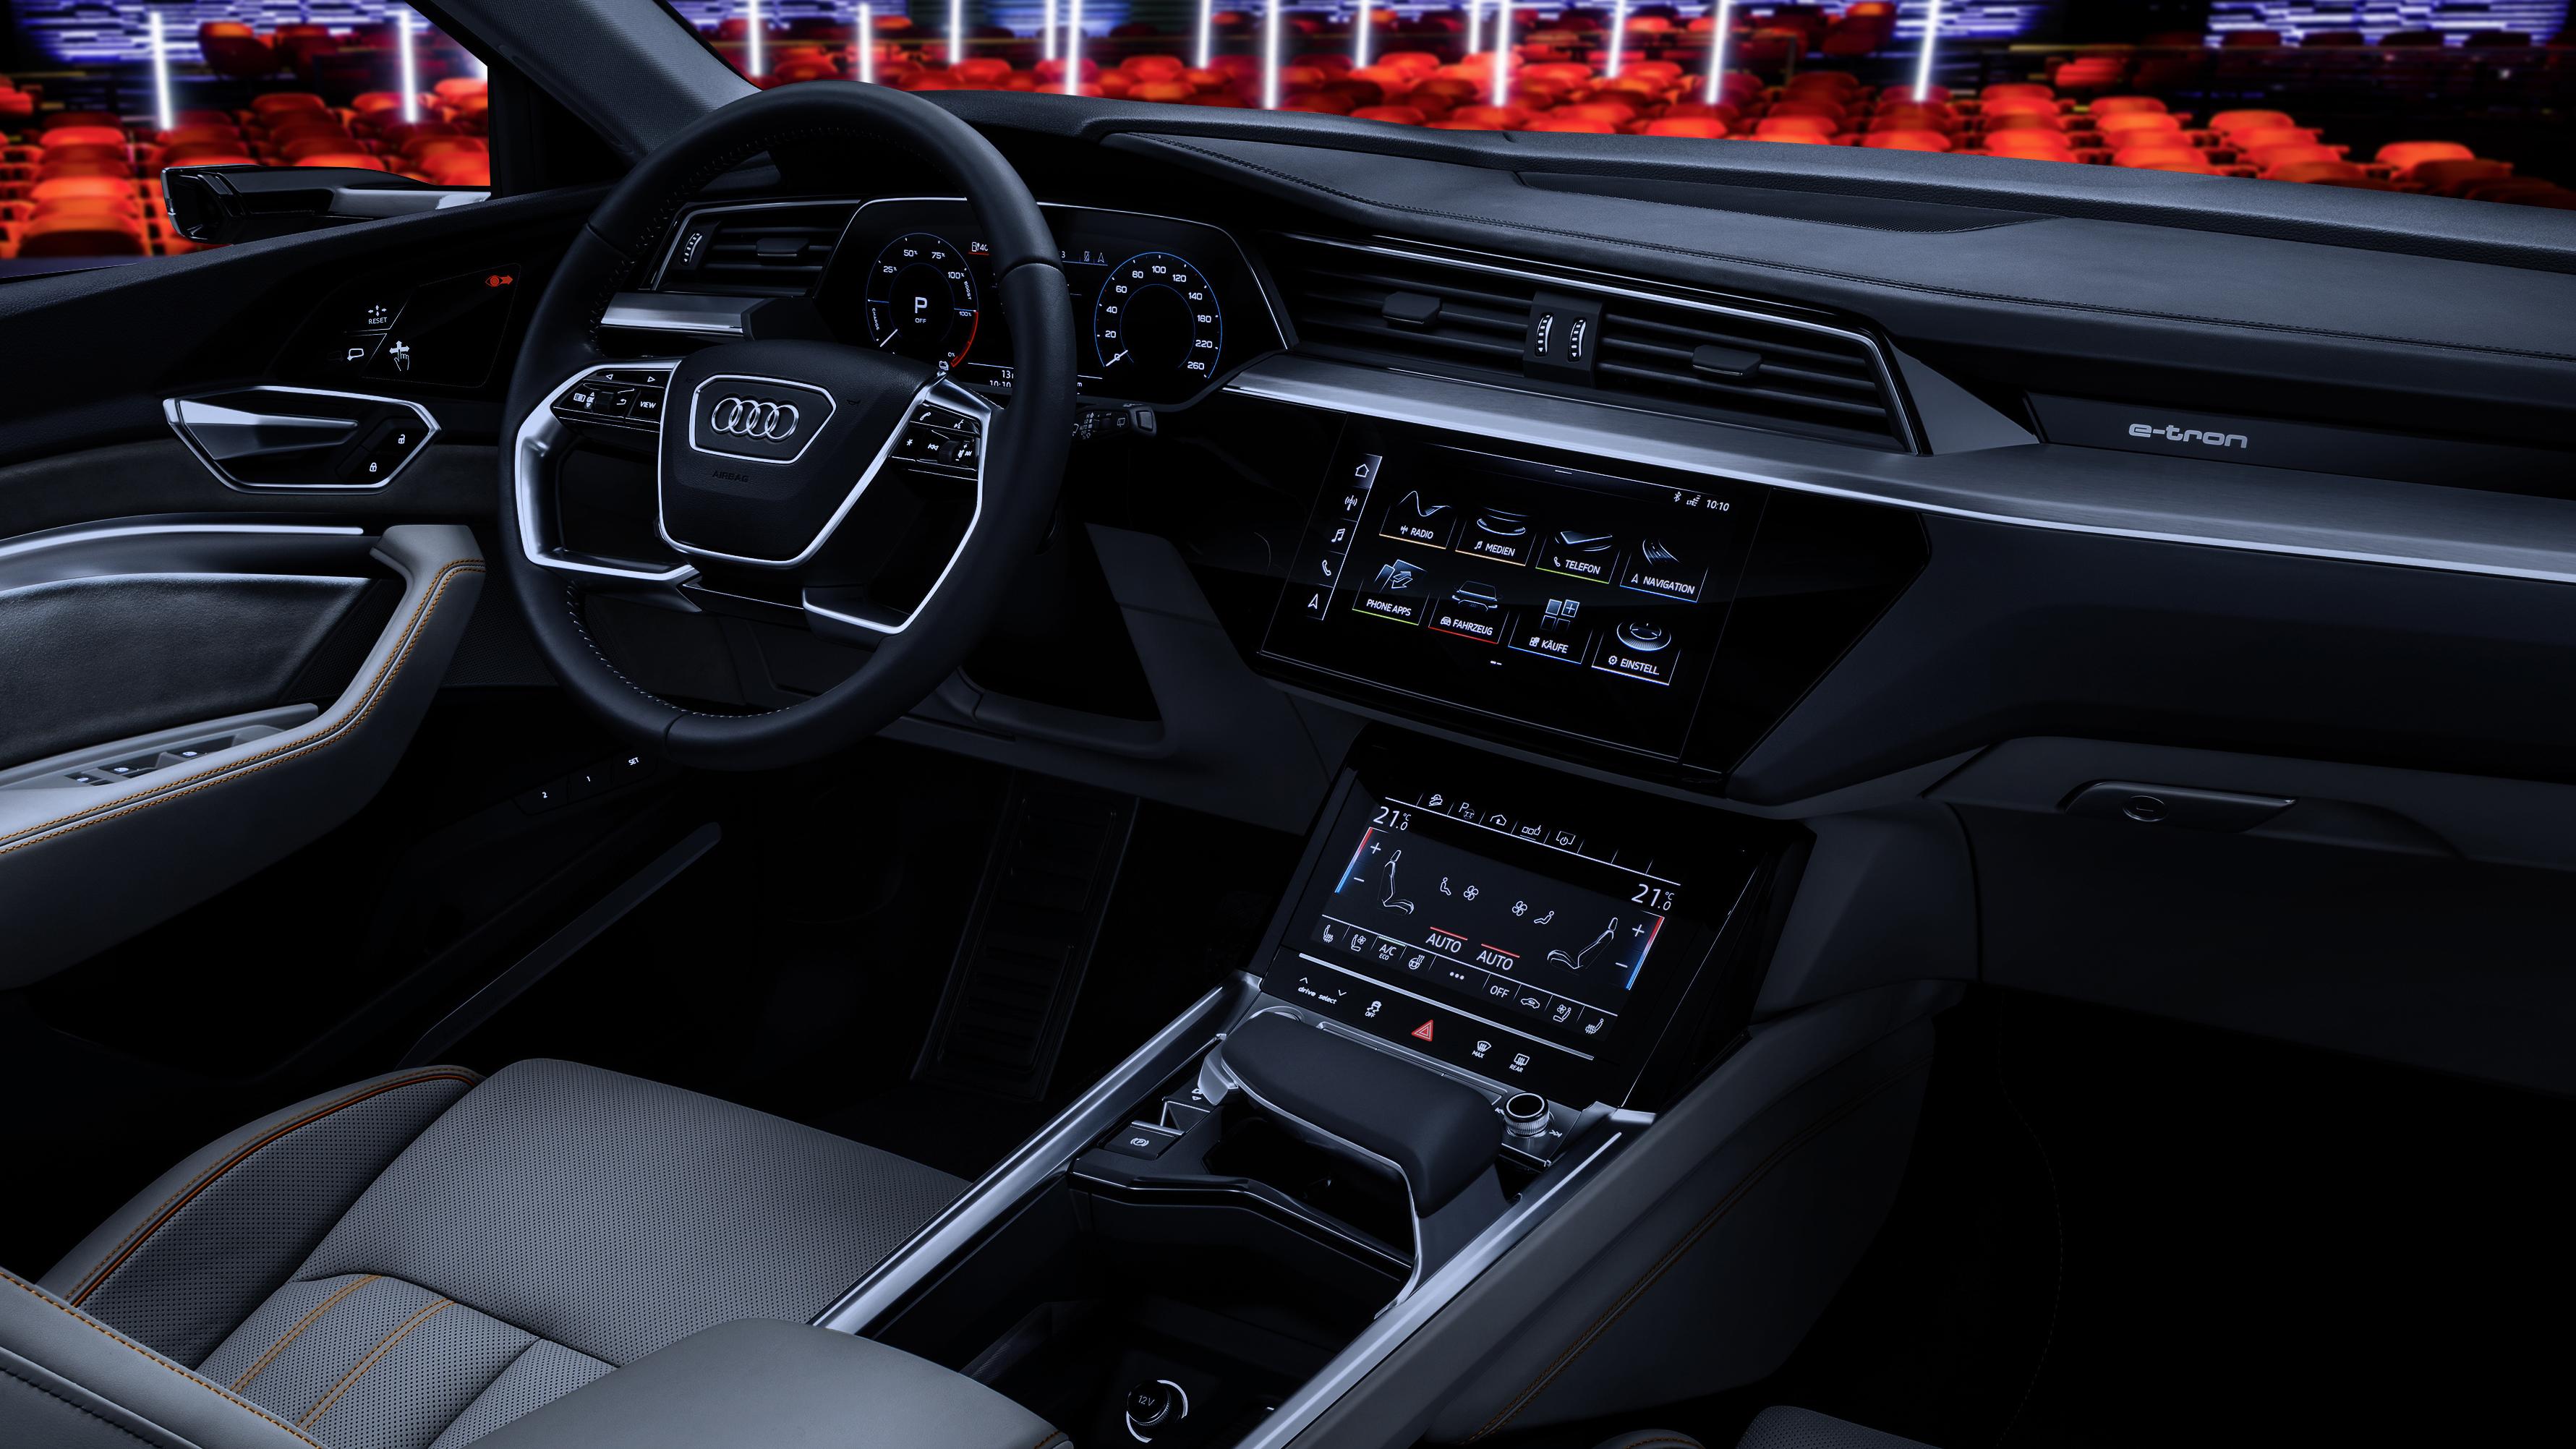 Take A Look Inside Audi S E Tron Electric Suv Top Gear